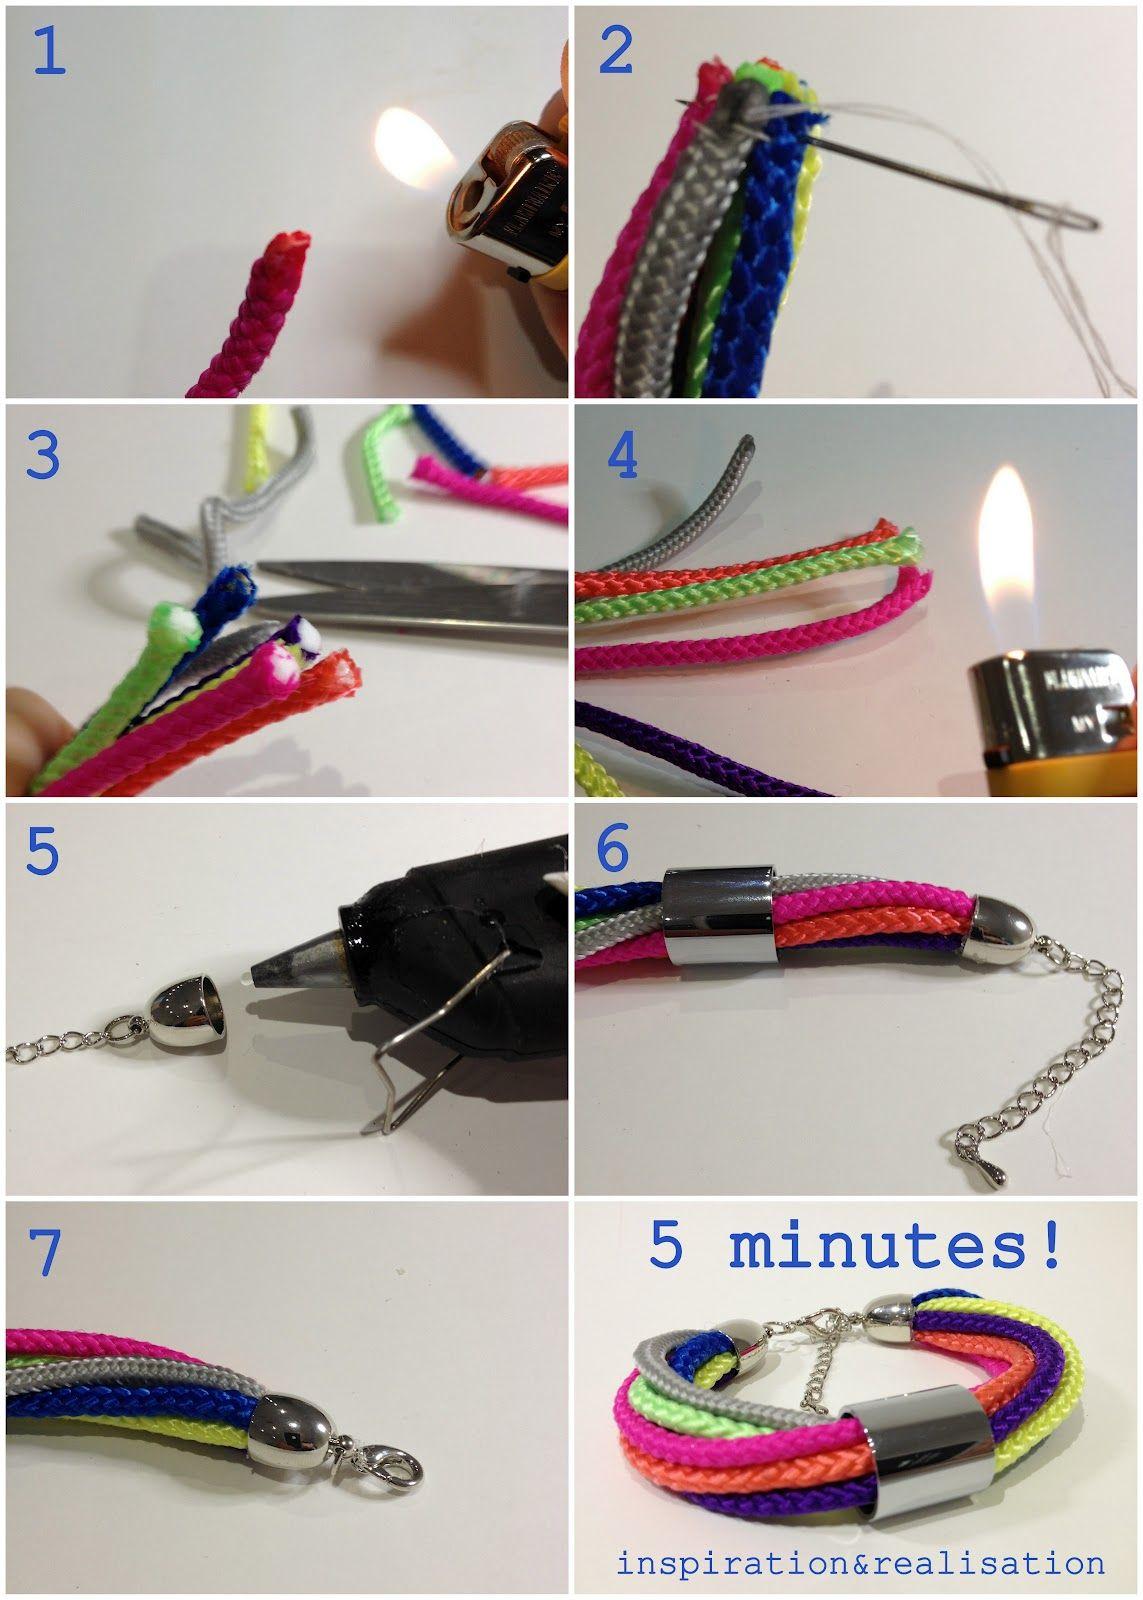 DIY rope style link bracelet